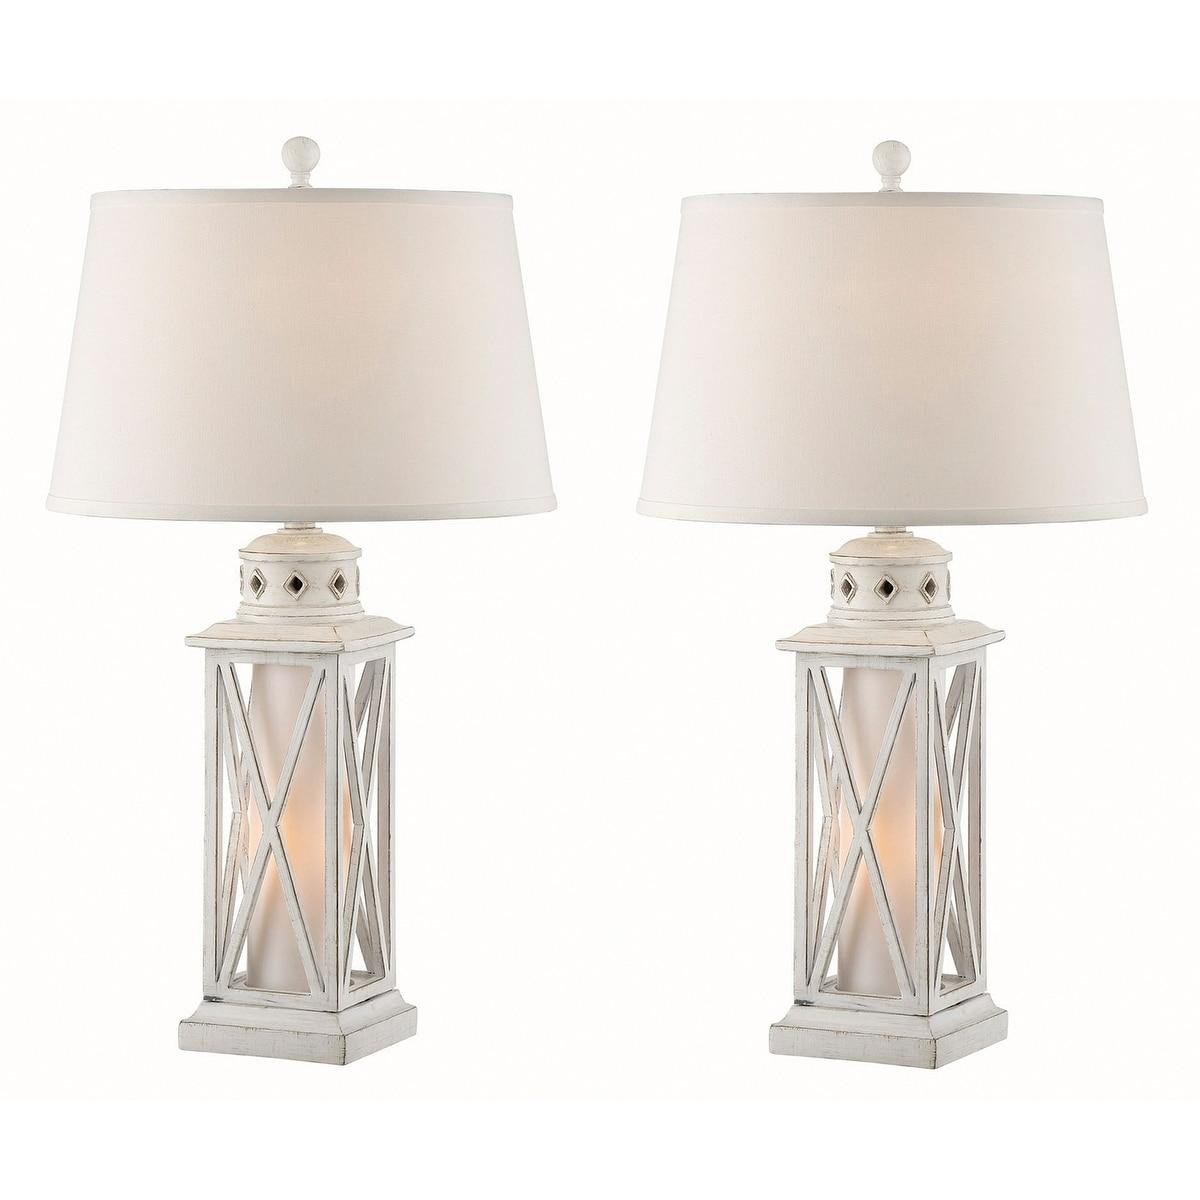 Shop Seahaven Galveston Island Lantern Night Light Table Lamp 30 5